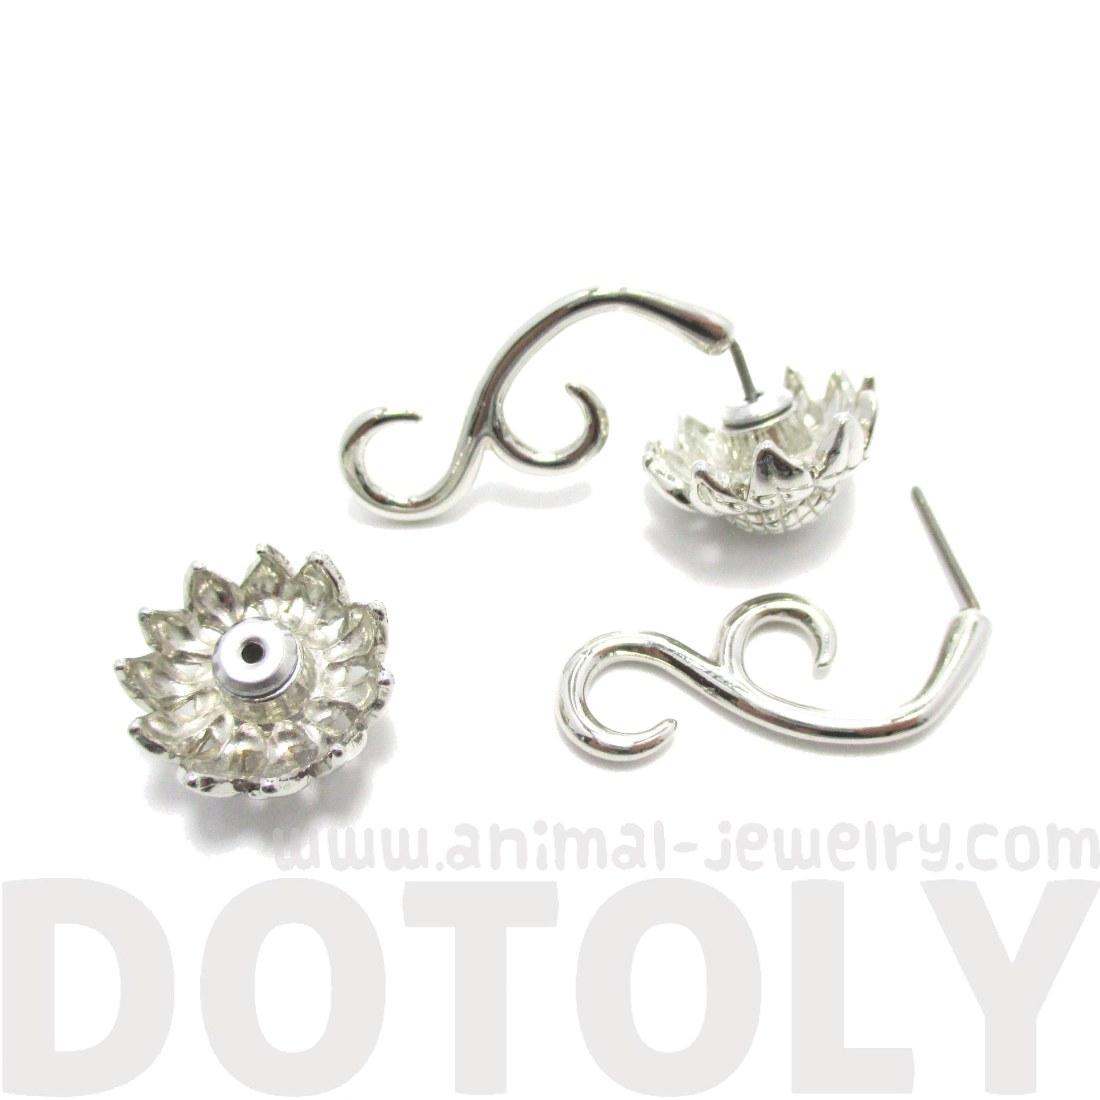 Sunflower Flower Shaped Fake Gauge Plug Stud Earrings in